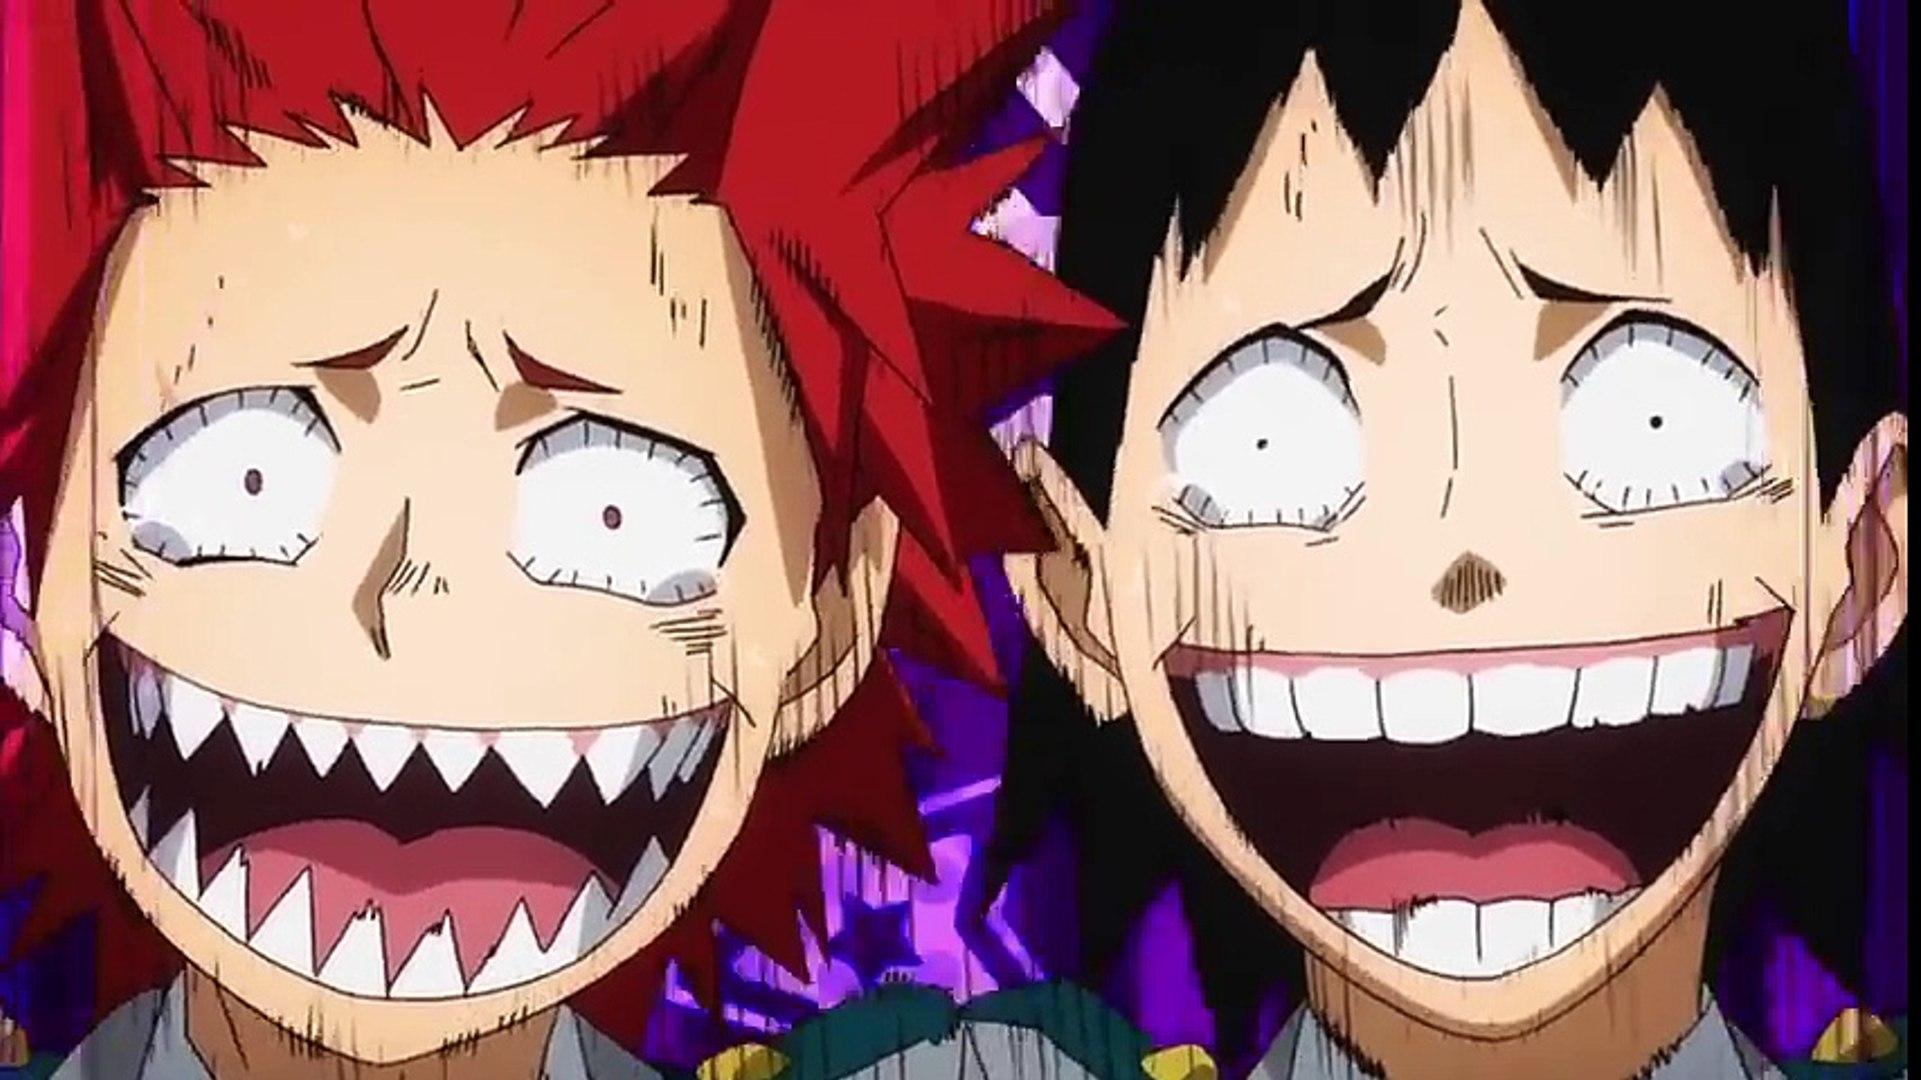 Kirishima And Sero Makes Fun Of Bakugo And His Hair Side Boy Boku No Hero Academia S02e20 Cartoons Tv Hd 2019